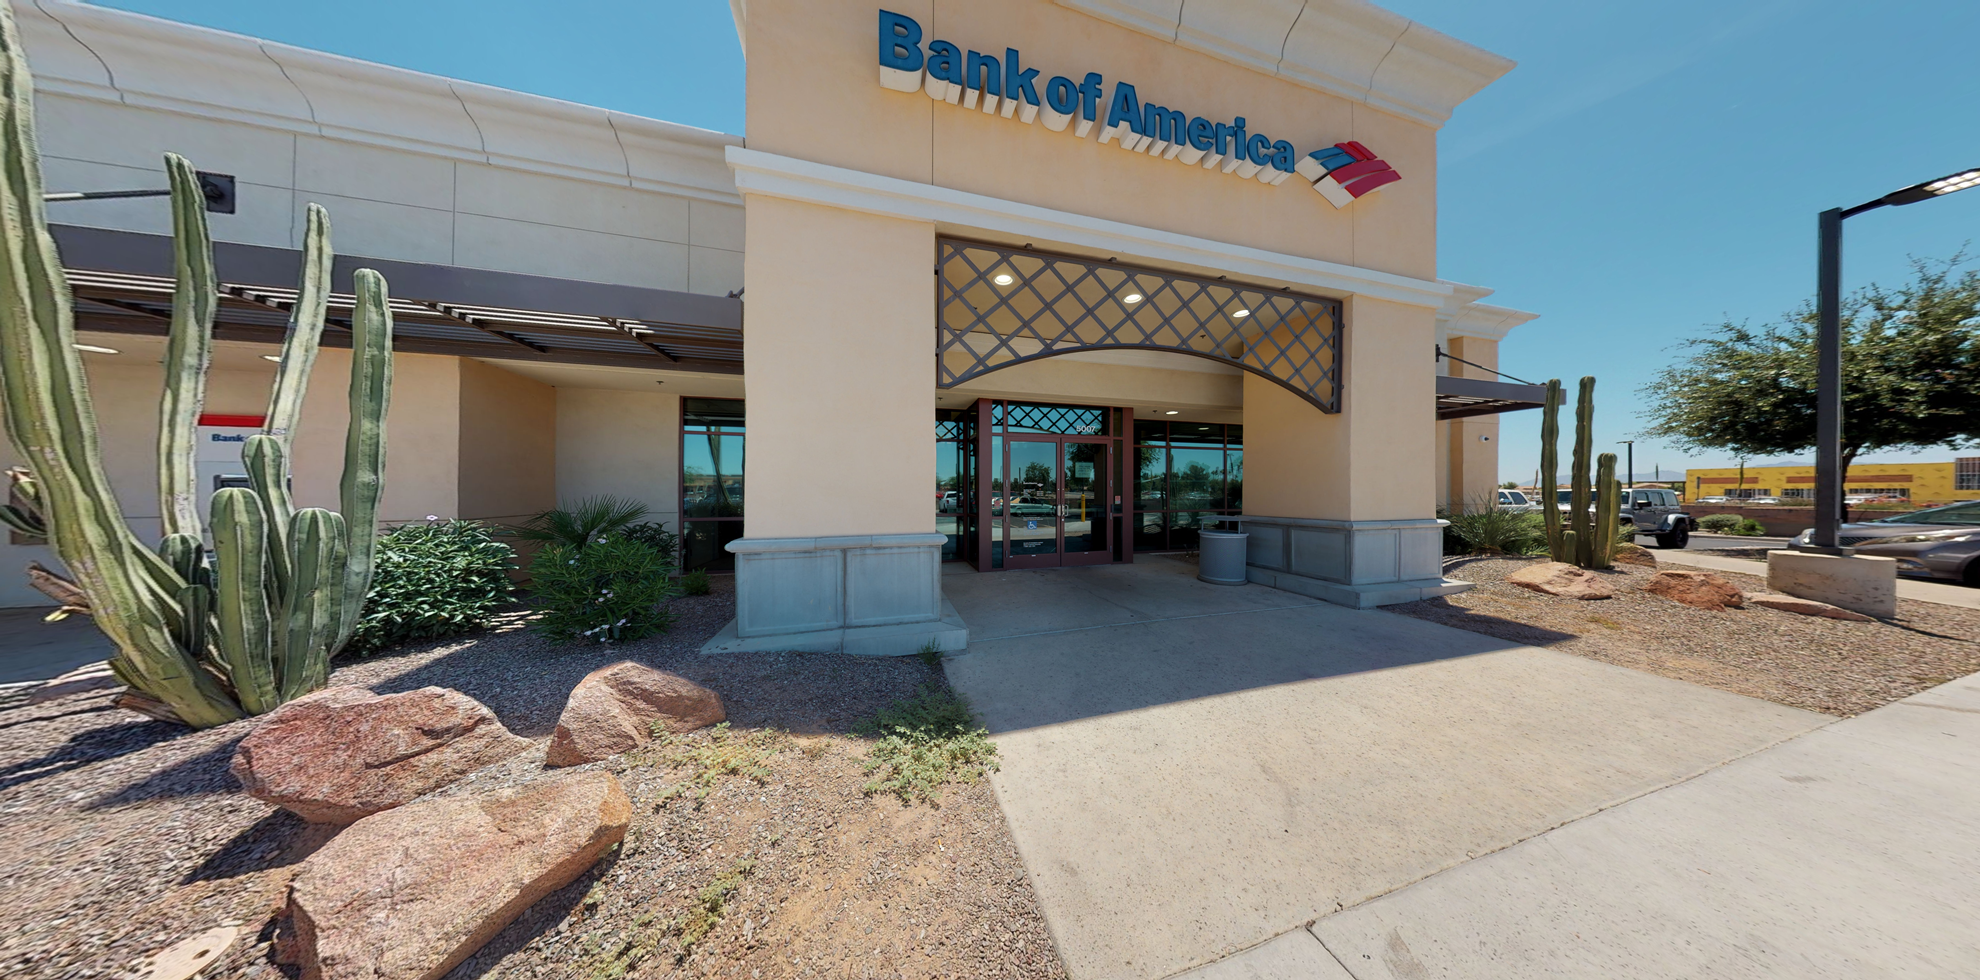 Bank of America financial center with drive-thru ATM   5007 N Dysart Rd, Litchfield Park, AZ 85340